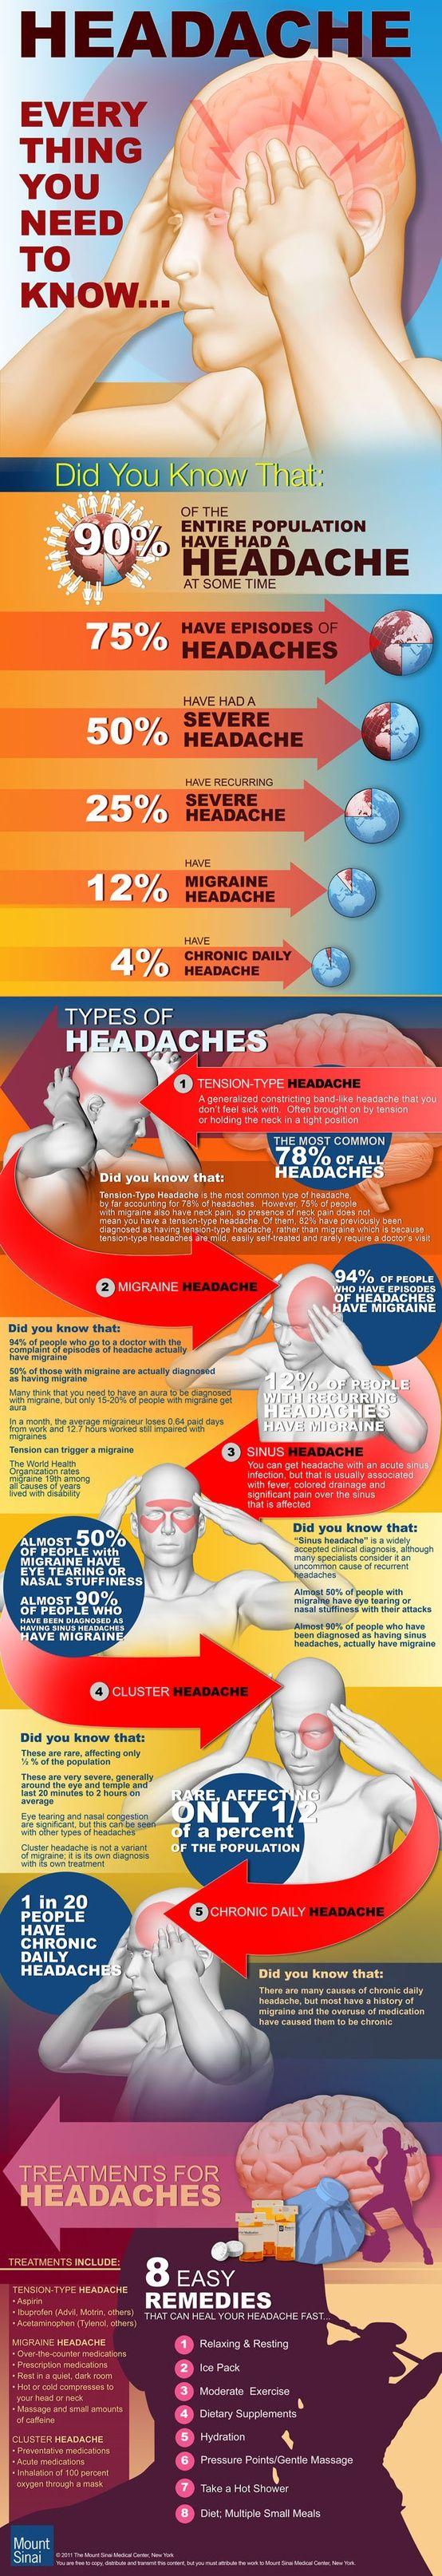 #Headache #Infographic